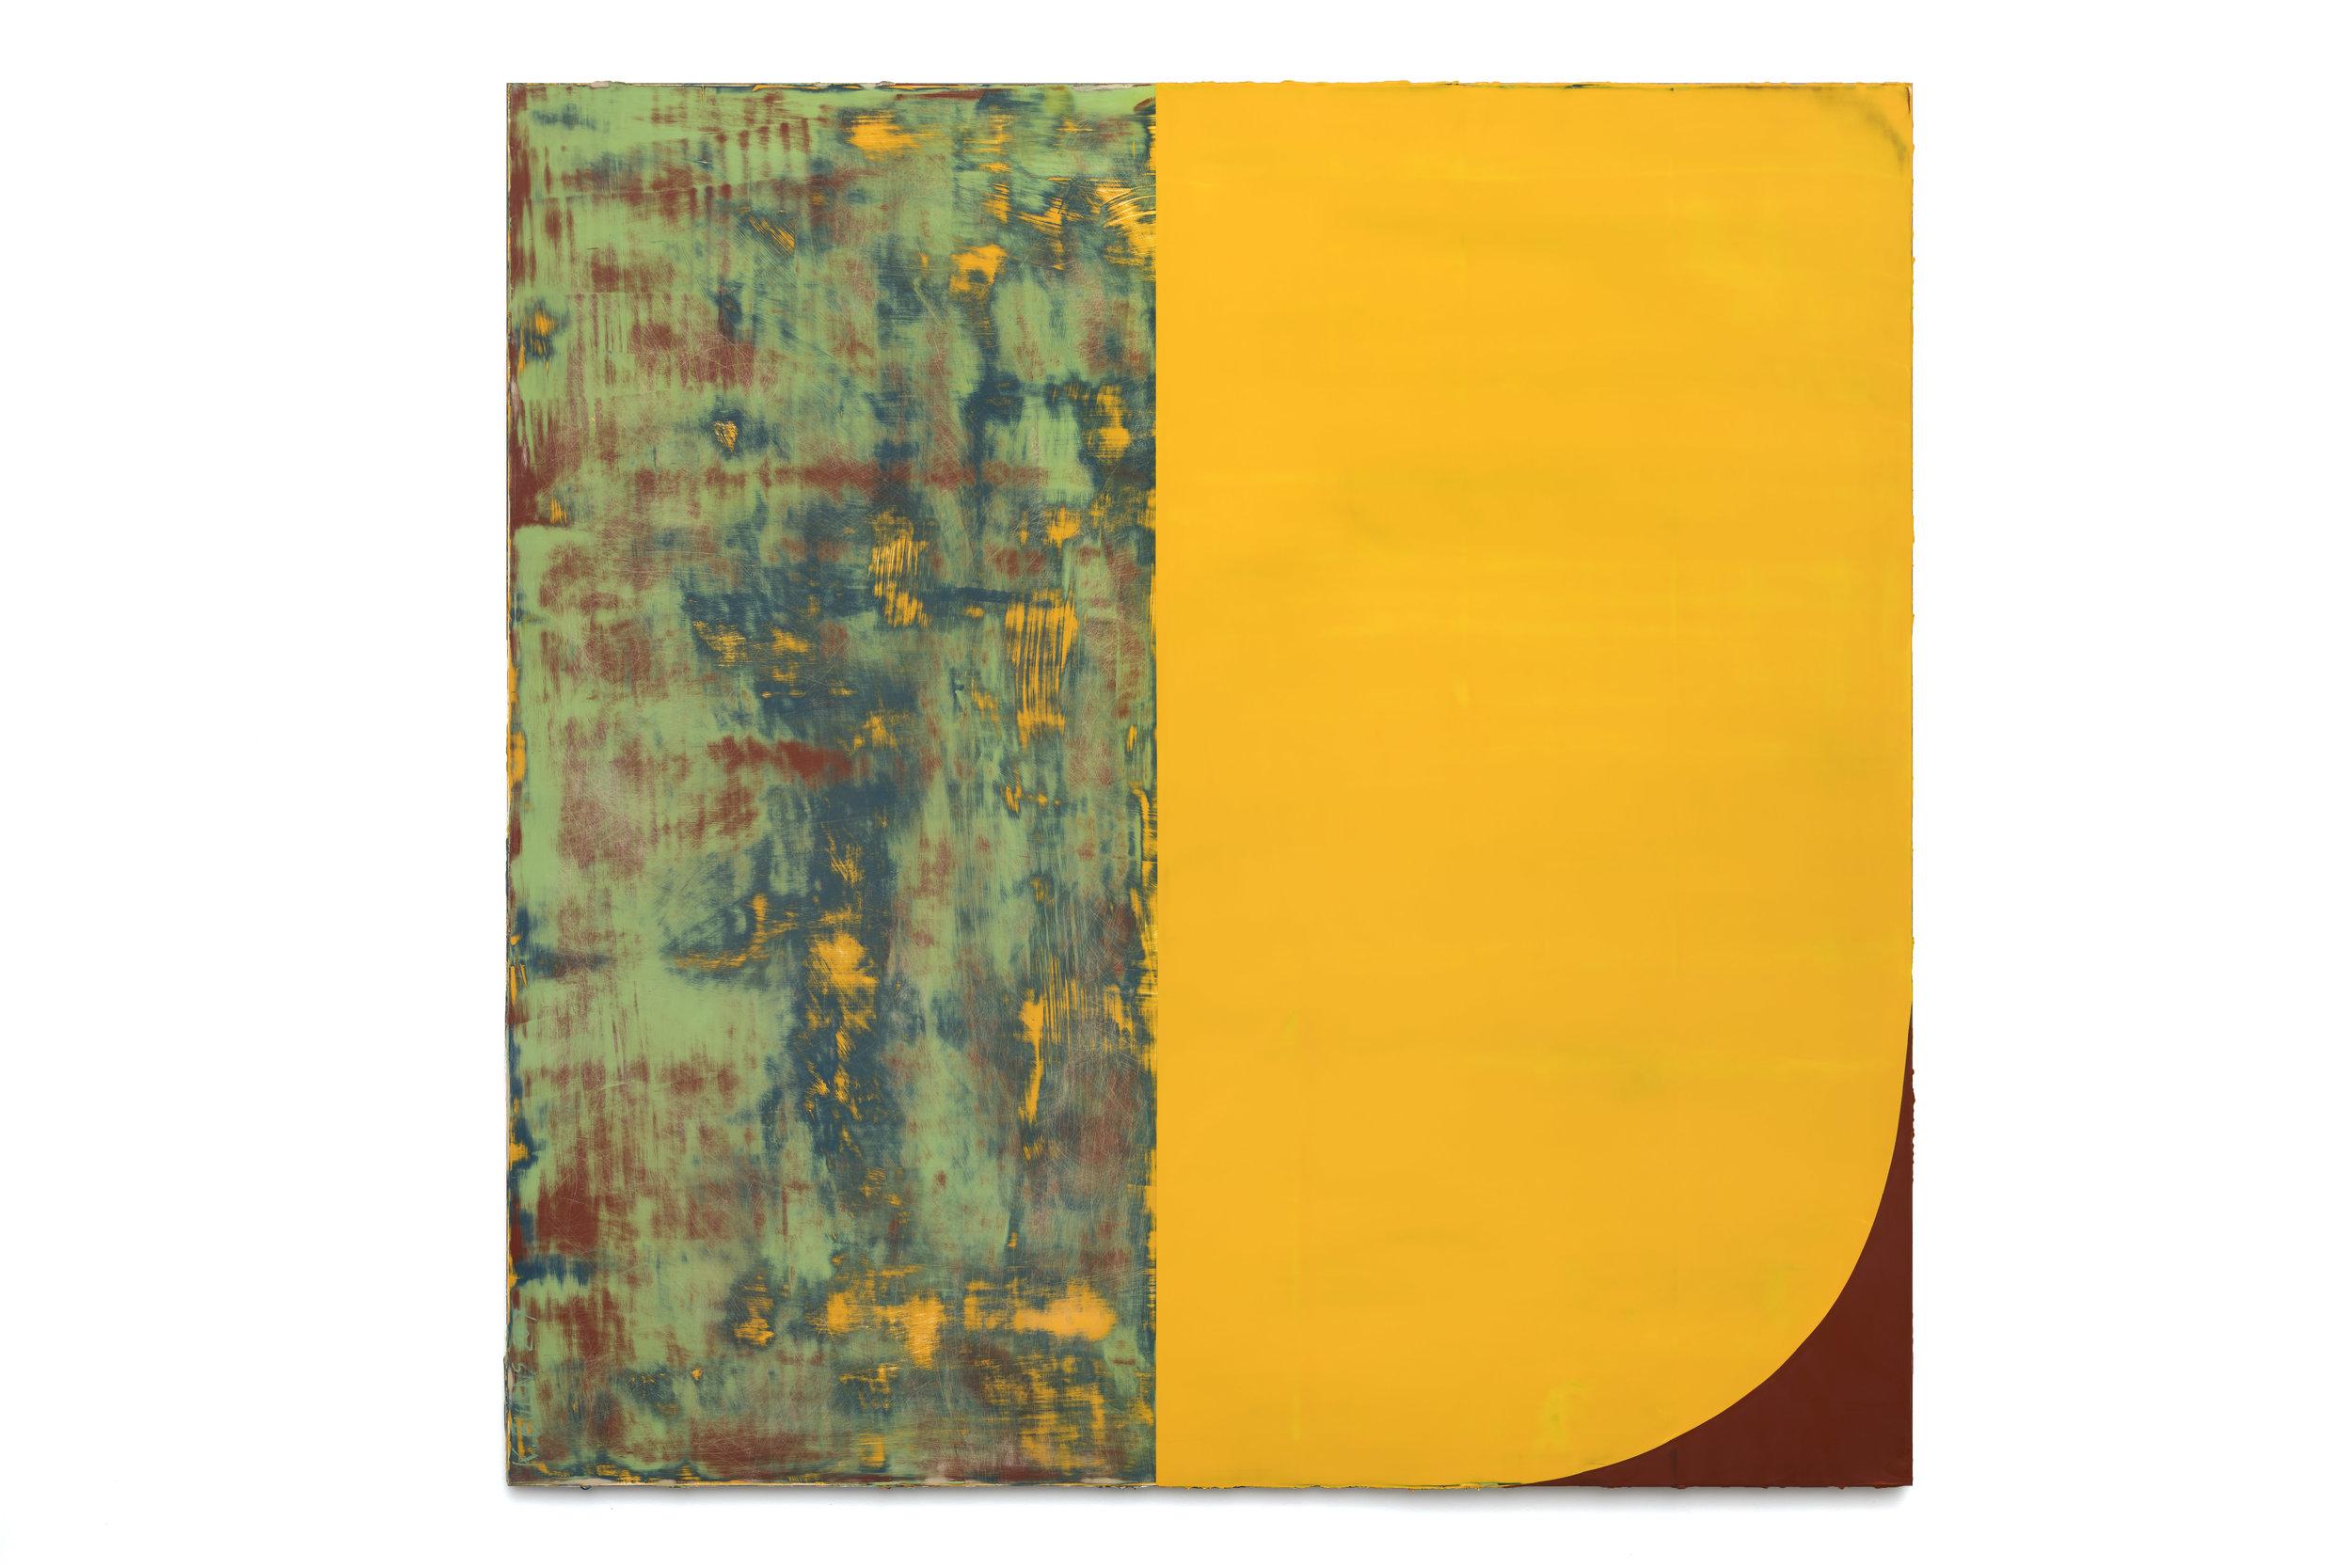 12:20 PM 5/11/17 , 2017  oil on Alu-DiBond 60 x 60 inches; 152.4 x 152.4 centimeters  $20,000.00